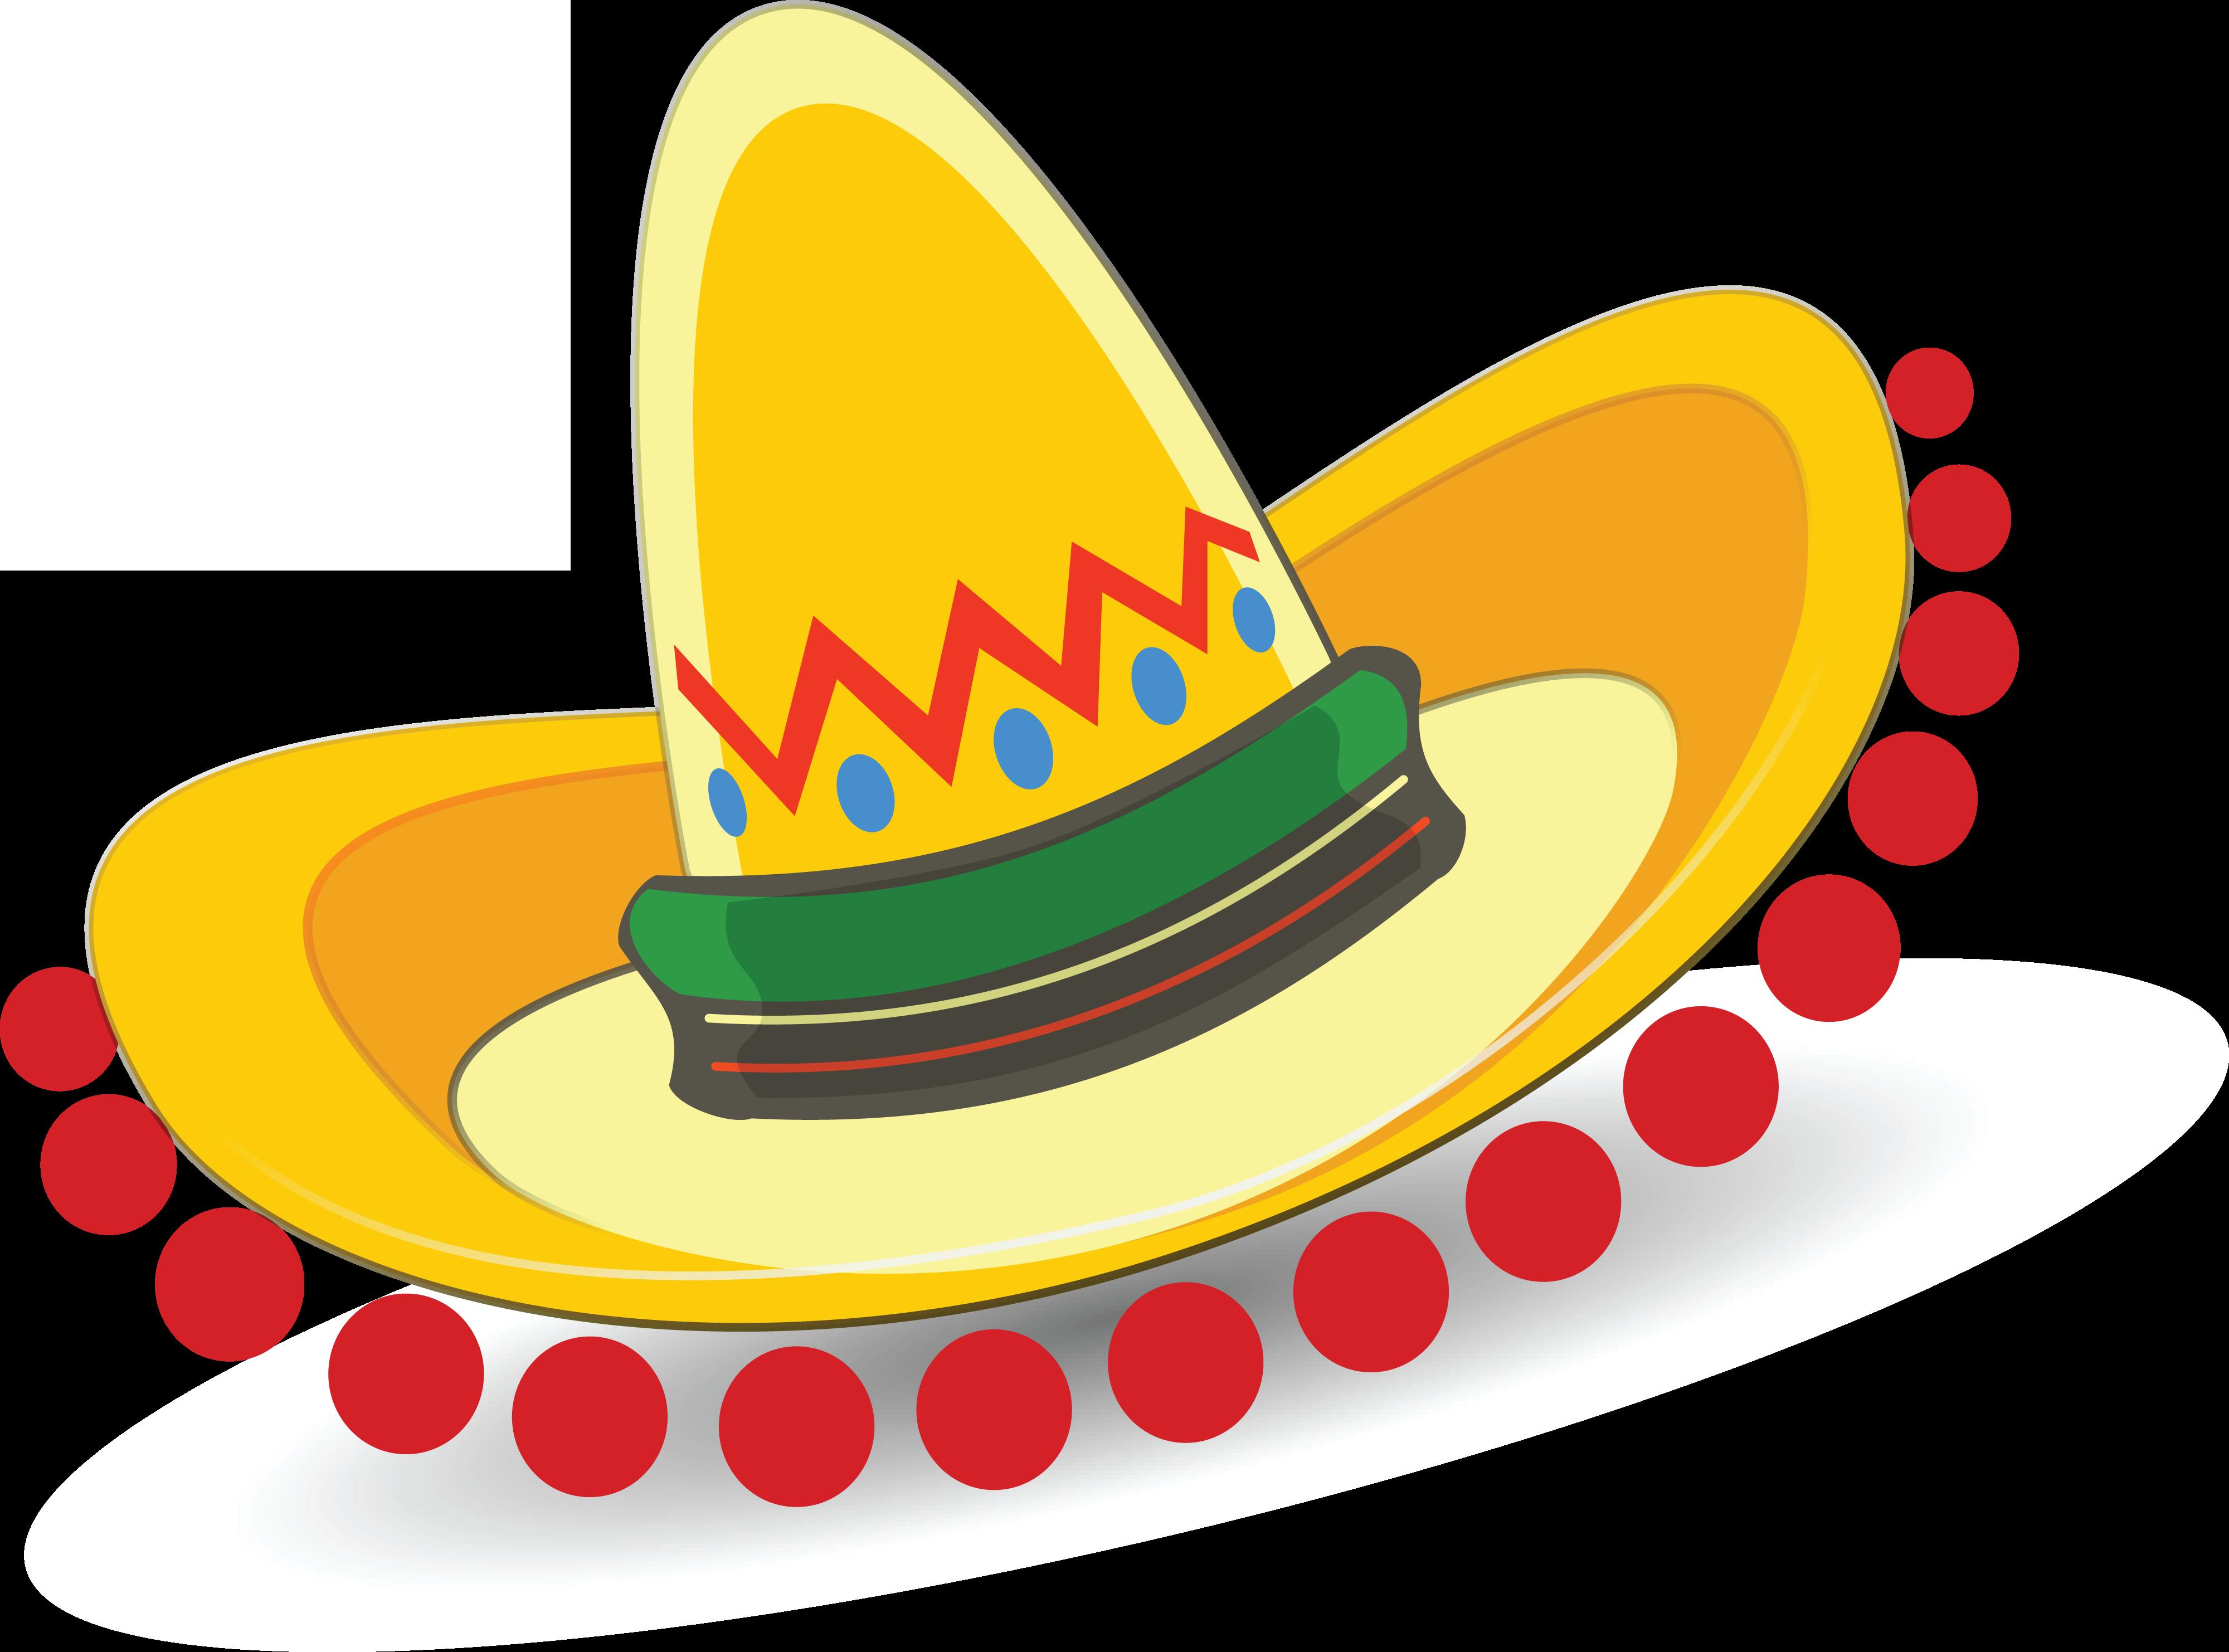 Maracas and sombrero clipart clip art library HD Free Clipart Of A Mexican Sombrero - Sombrero Clip Art ... clip art library